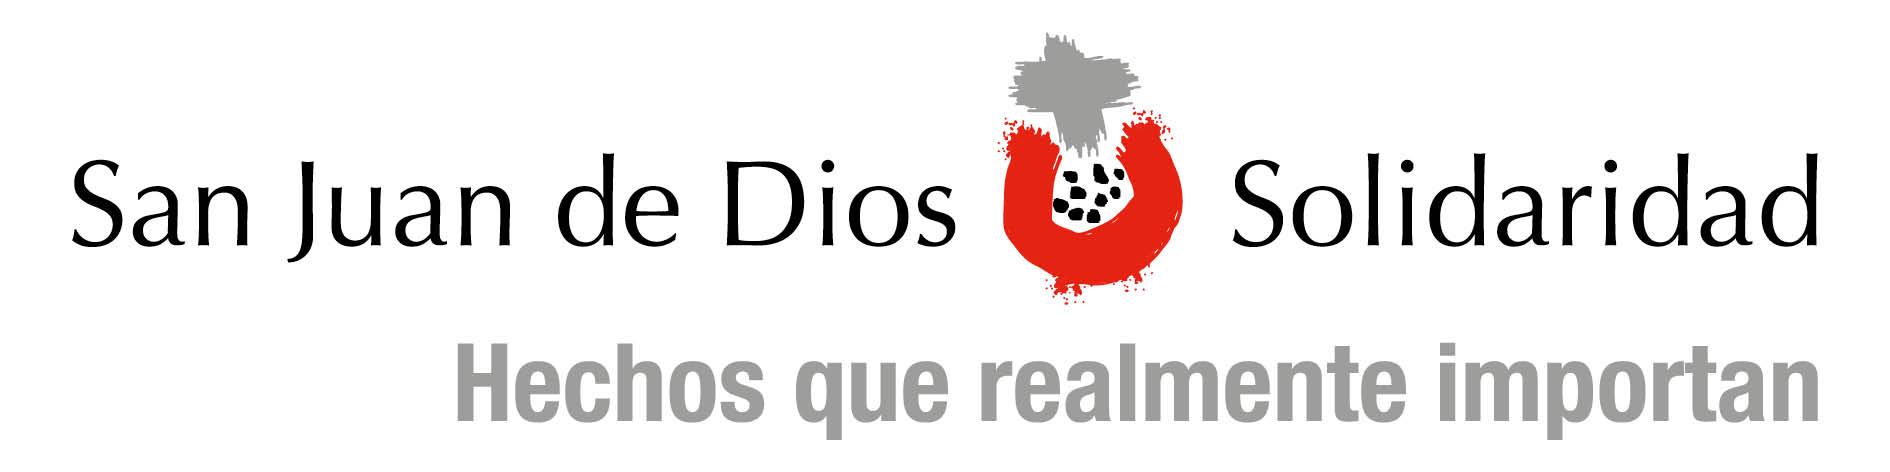 sjd_solidaridad_hechos